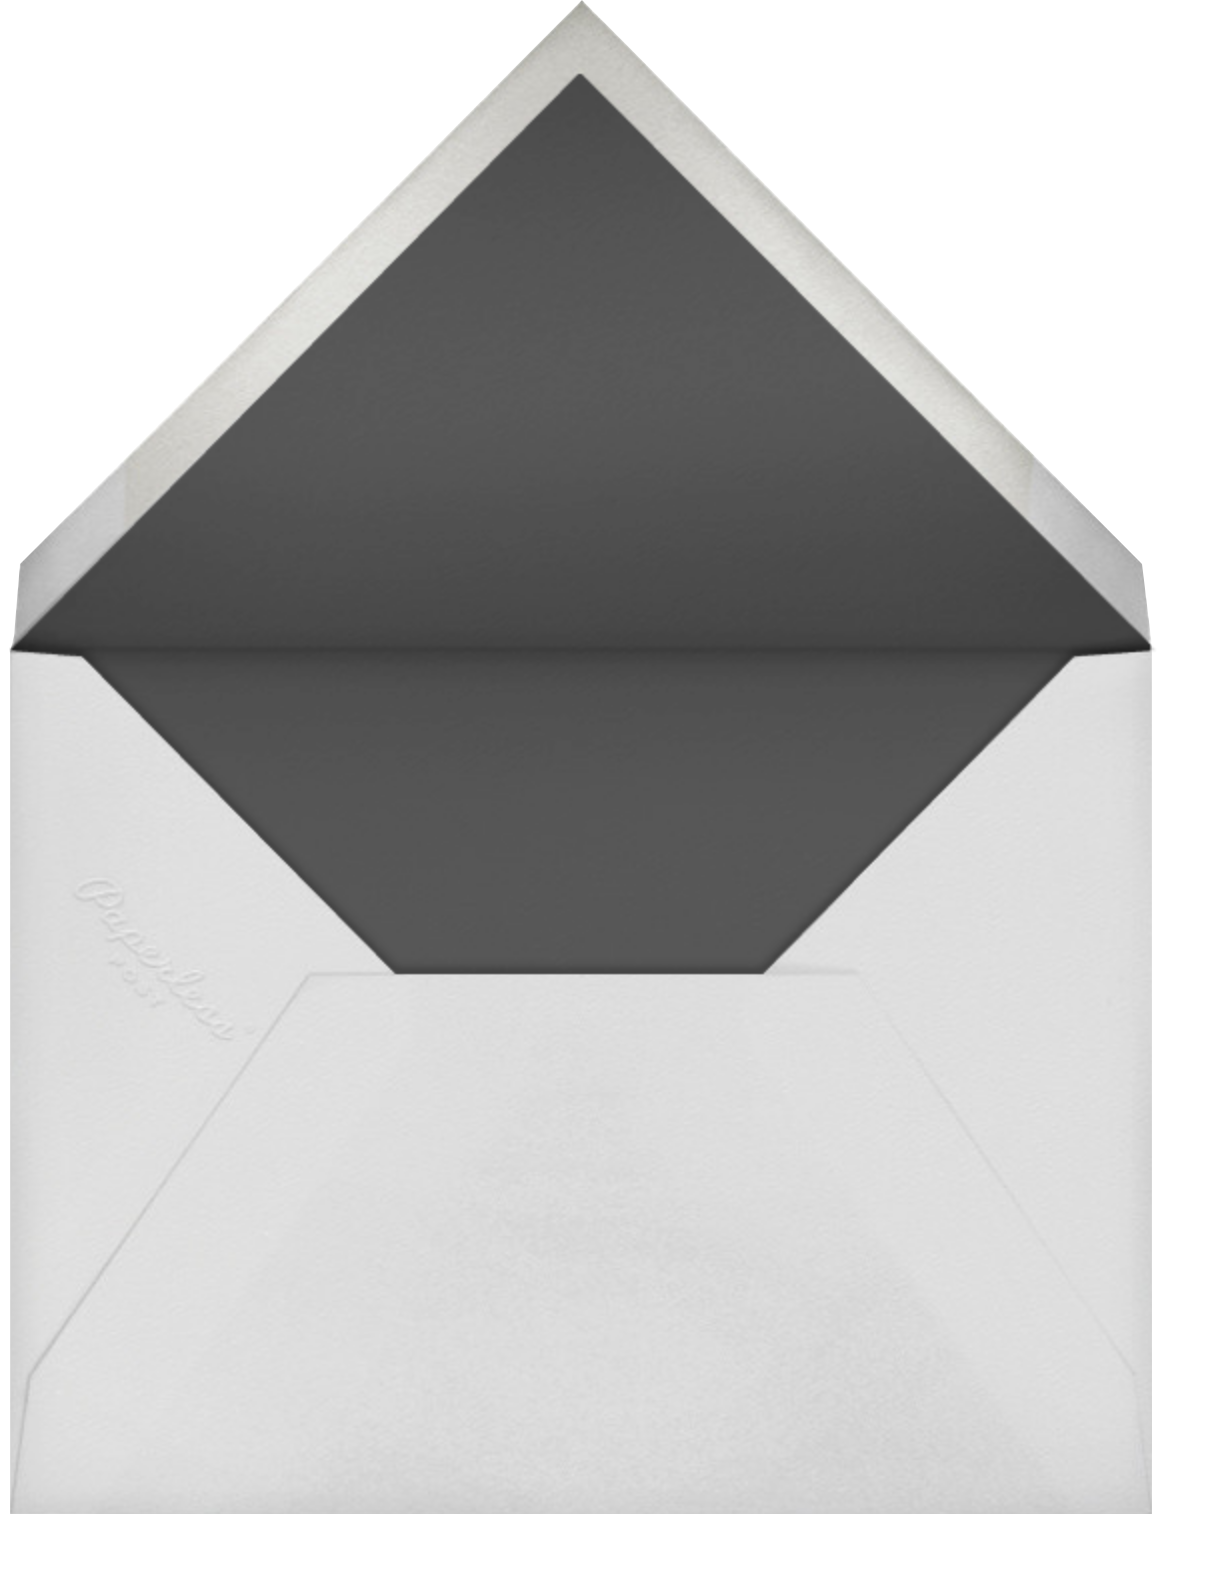 Plinth - Pewter Gray - Vera Wang - All - envelope back